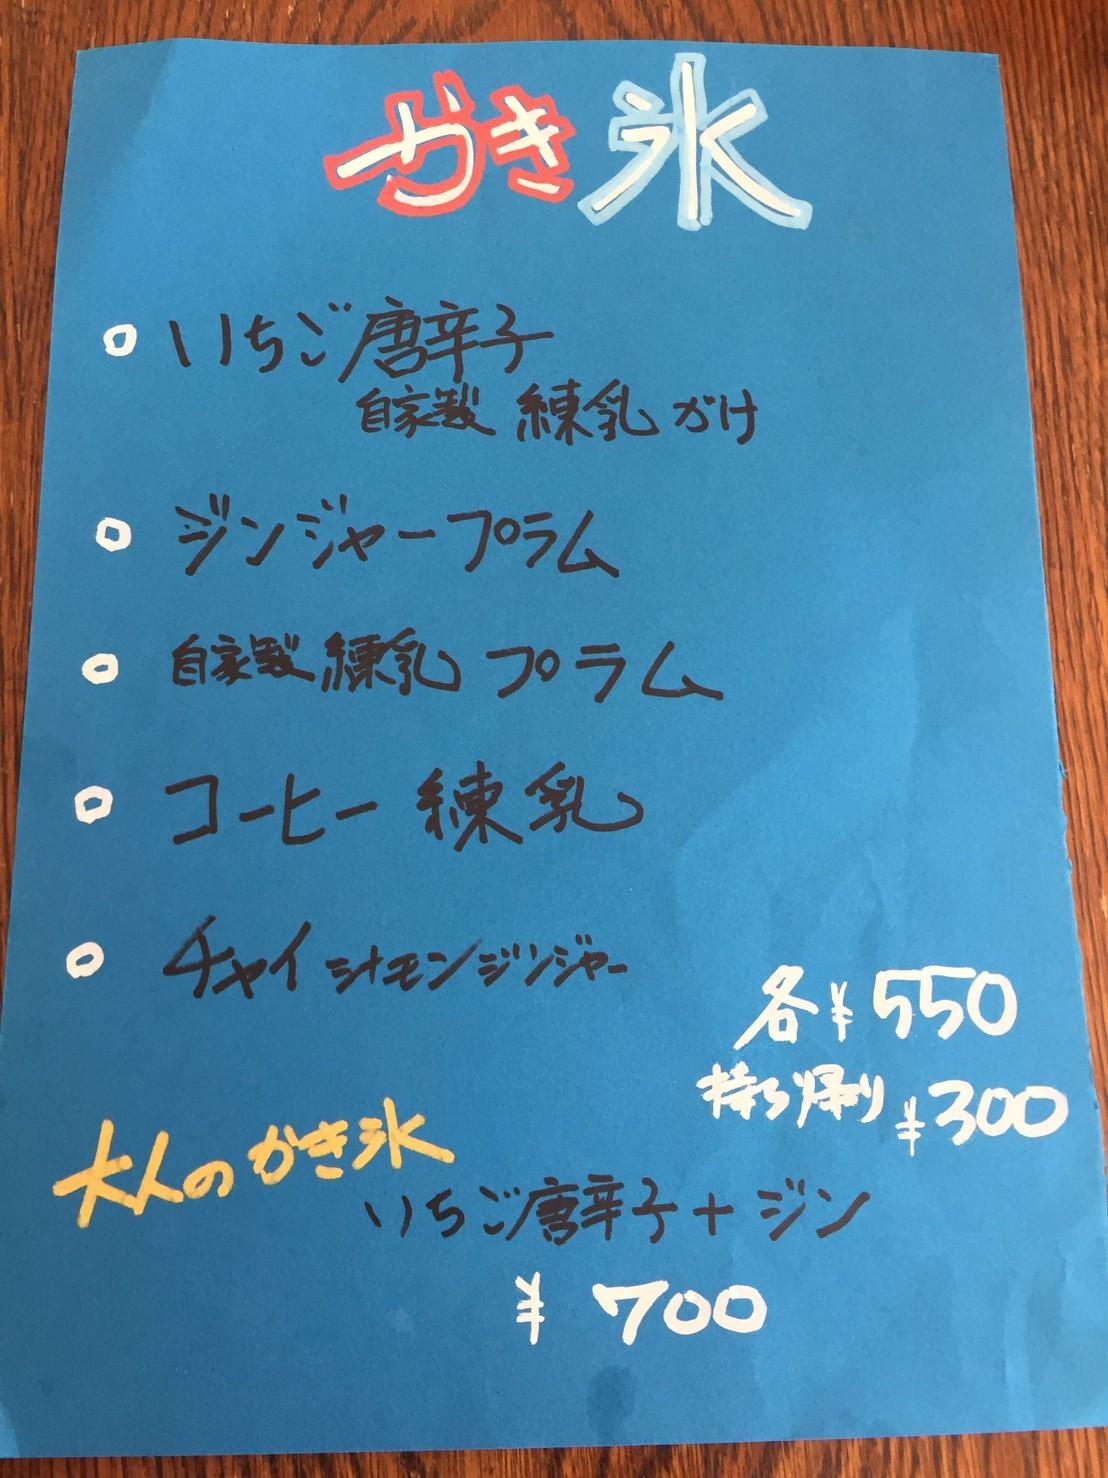 Tottori カルマ  カルマ焼飯_e0115904_22403399.jpg